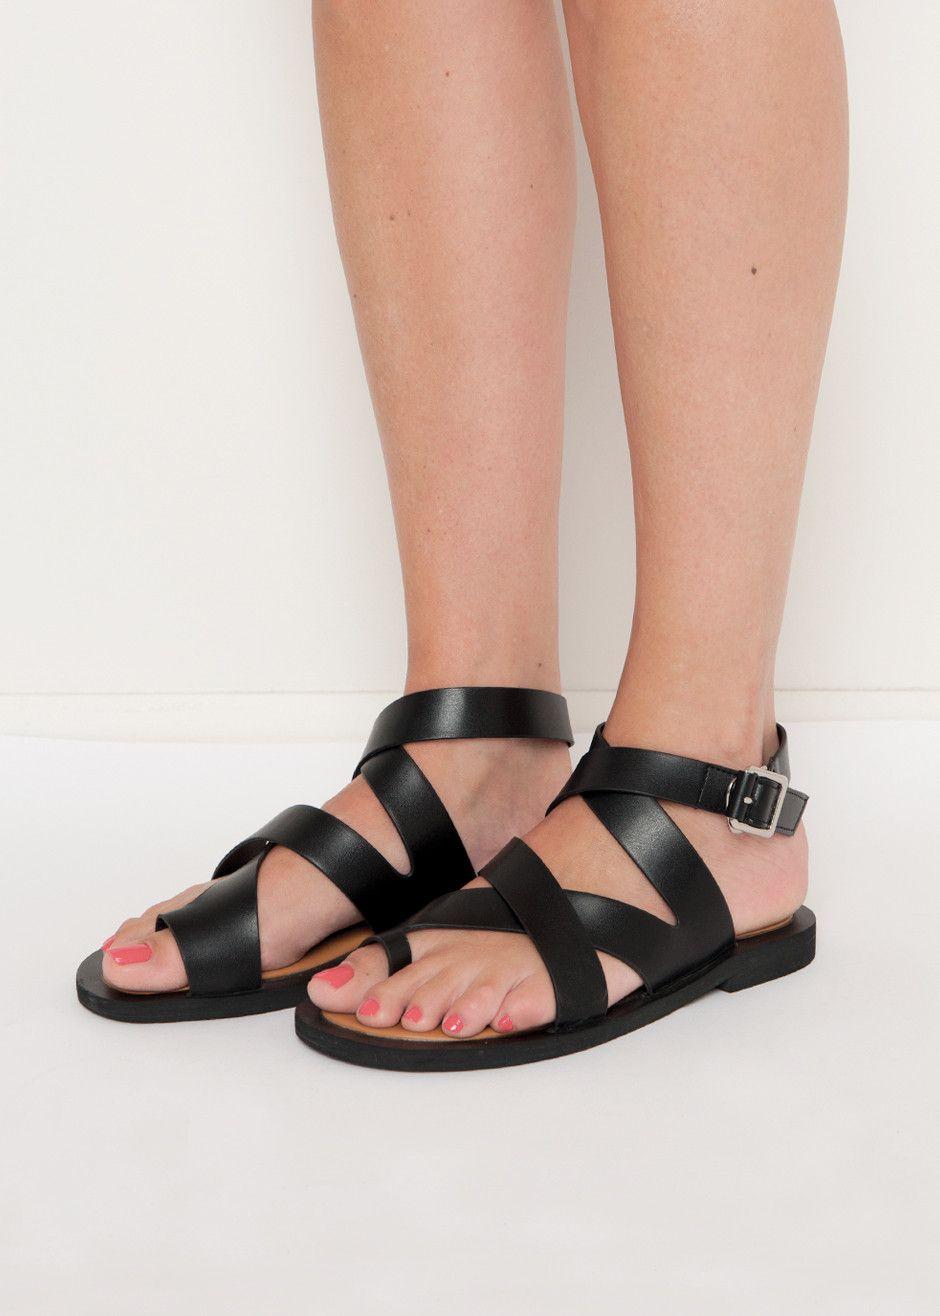 Cross straps, Strap sandals